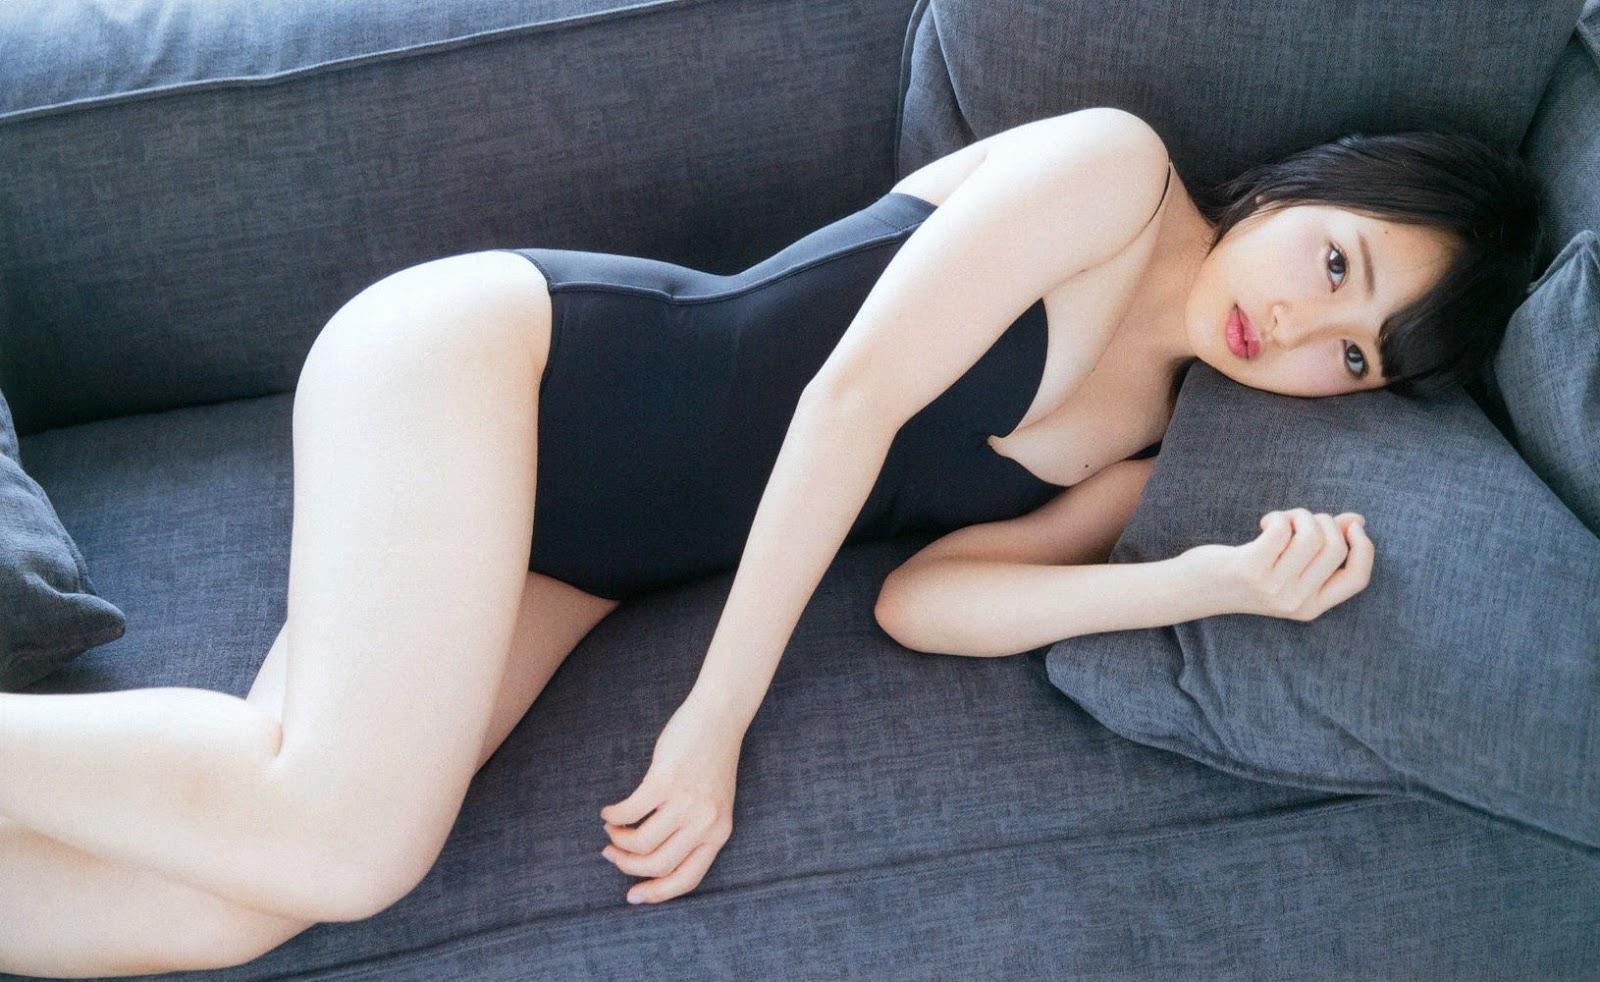 Mukaichi Mion 向井地美音, BOMB! 2016.06 (ボム 2016年06月号)